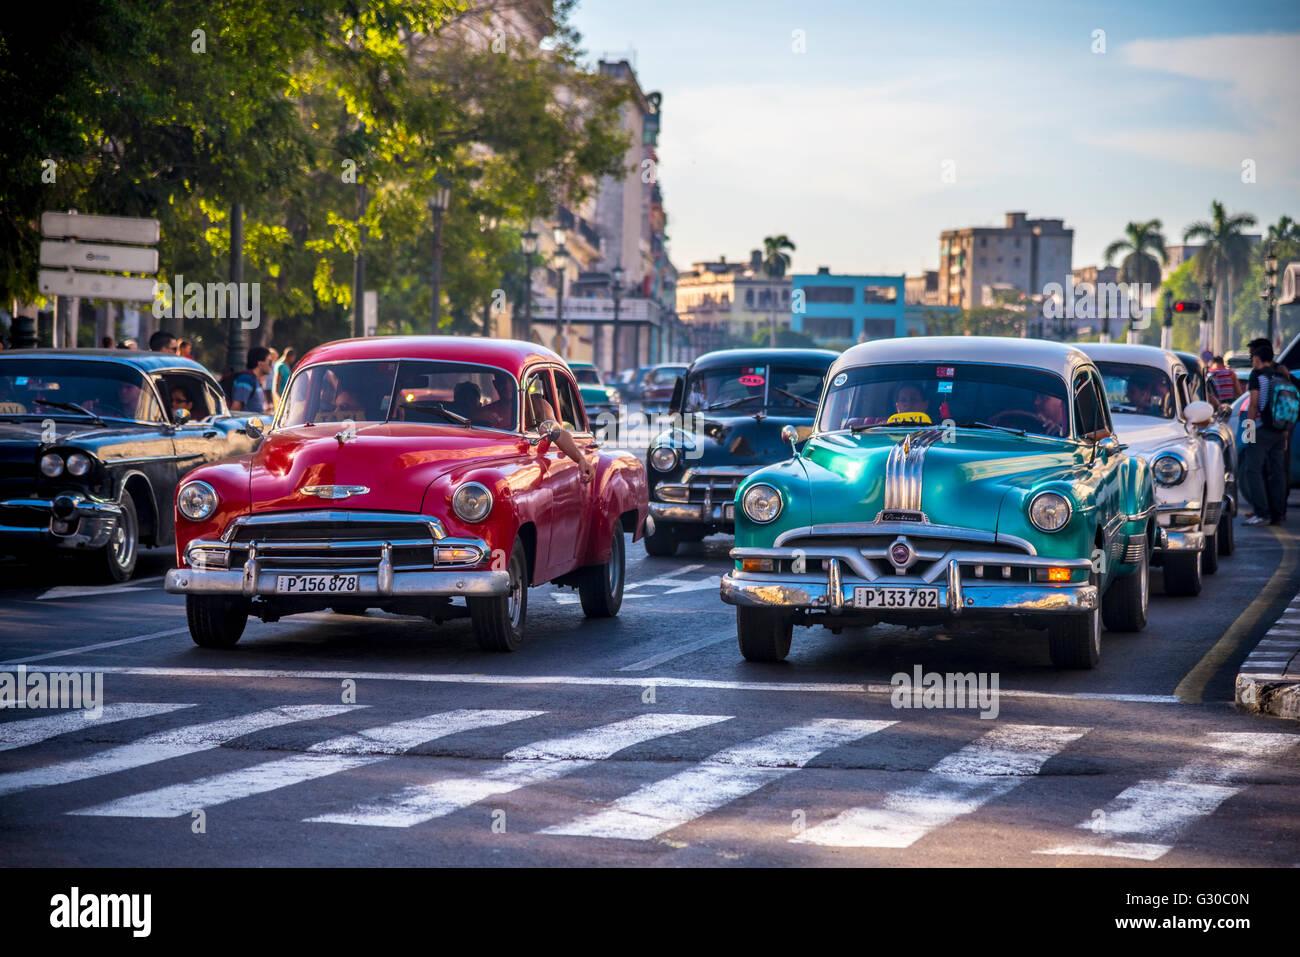 Classic 1950s American cars, Paseo di Marti, La Habana Vieja (Old Havana), Havana, Cuba, West Indies, Caribbean, - Stock Image